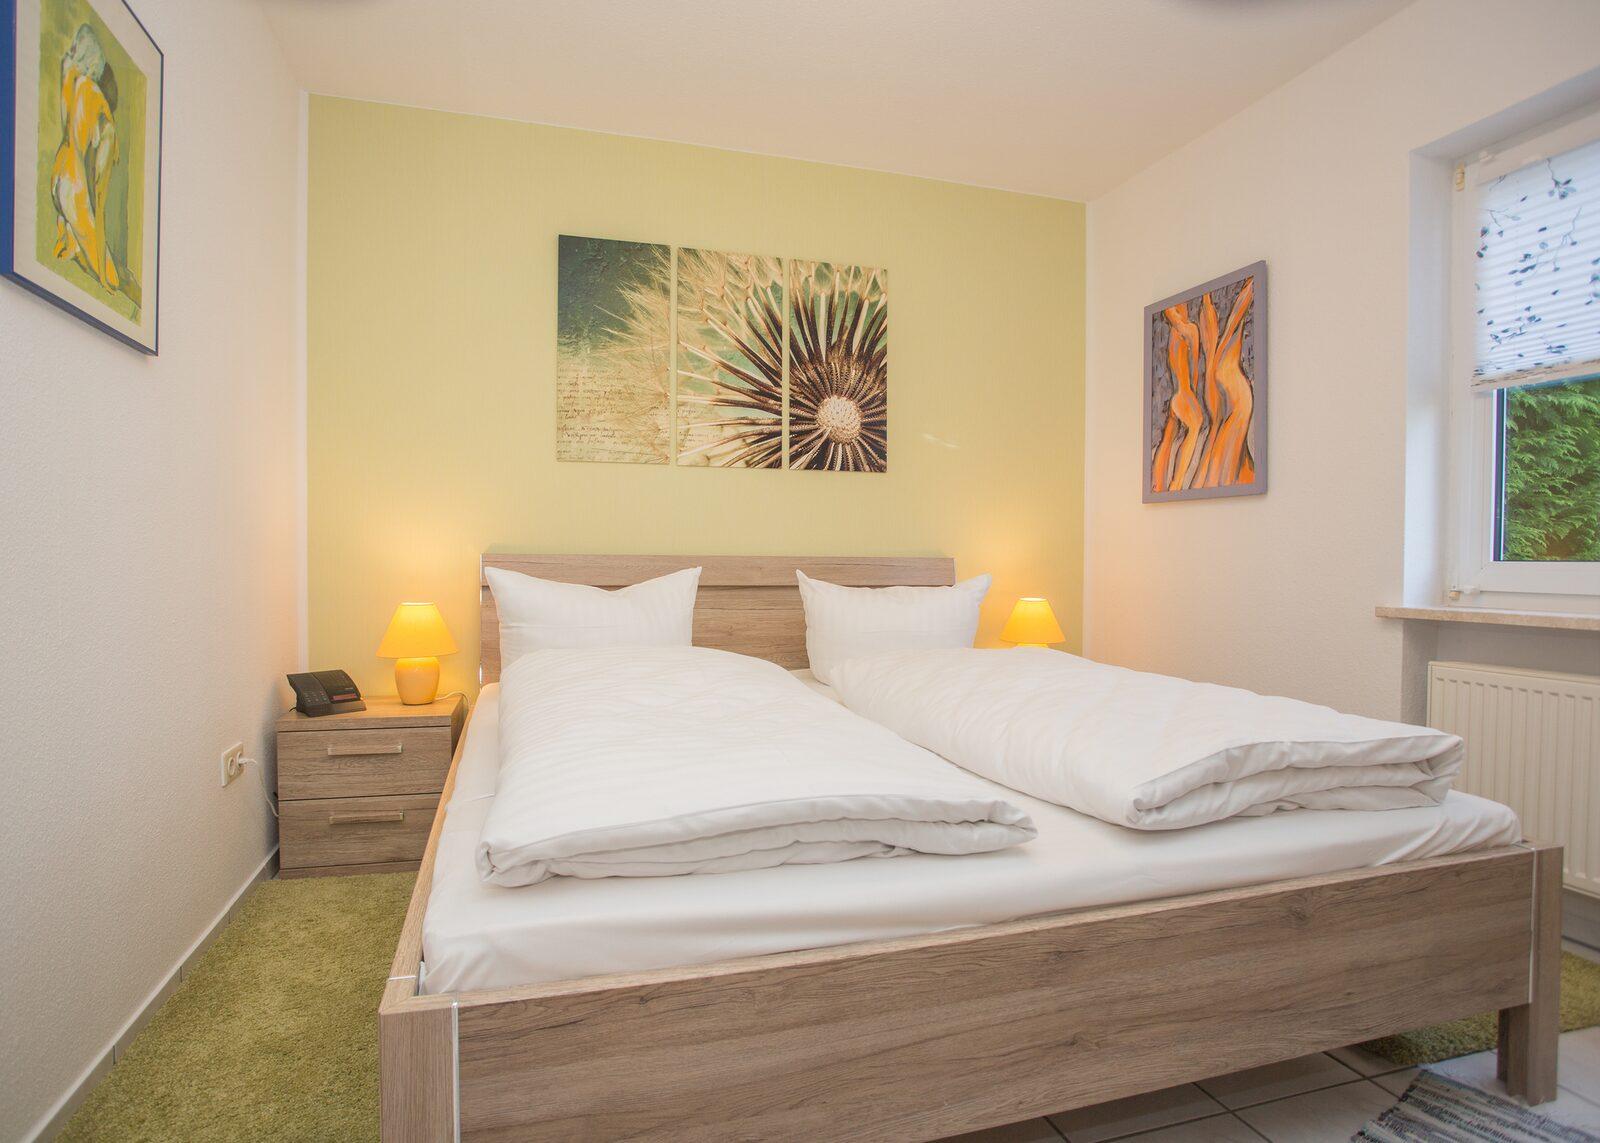 Apartment - Am Bergelchen 65-M | Winterberg-Niedersfeld